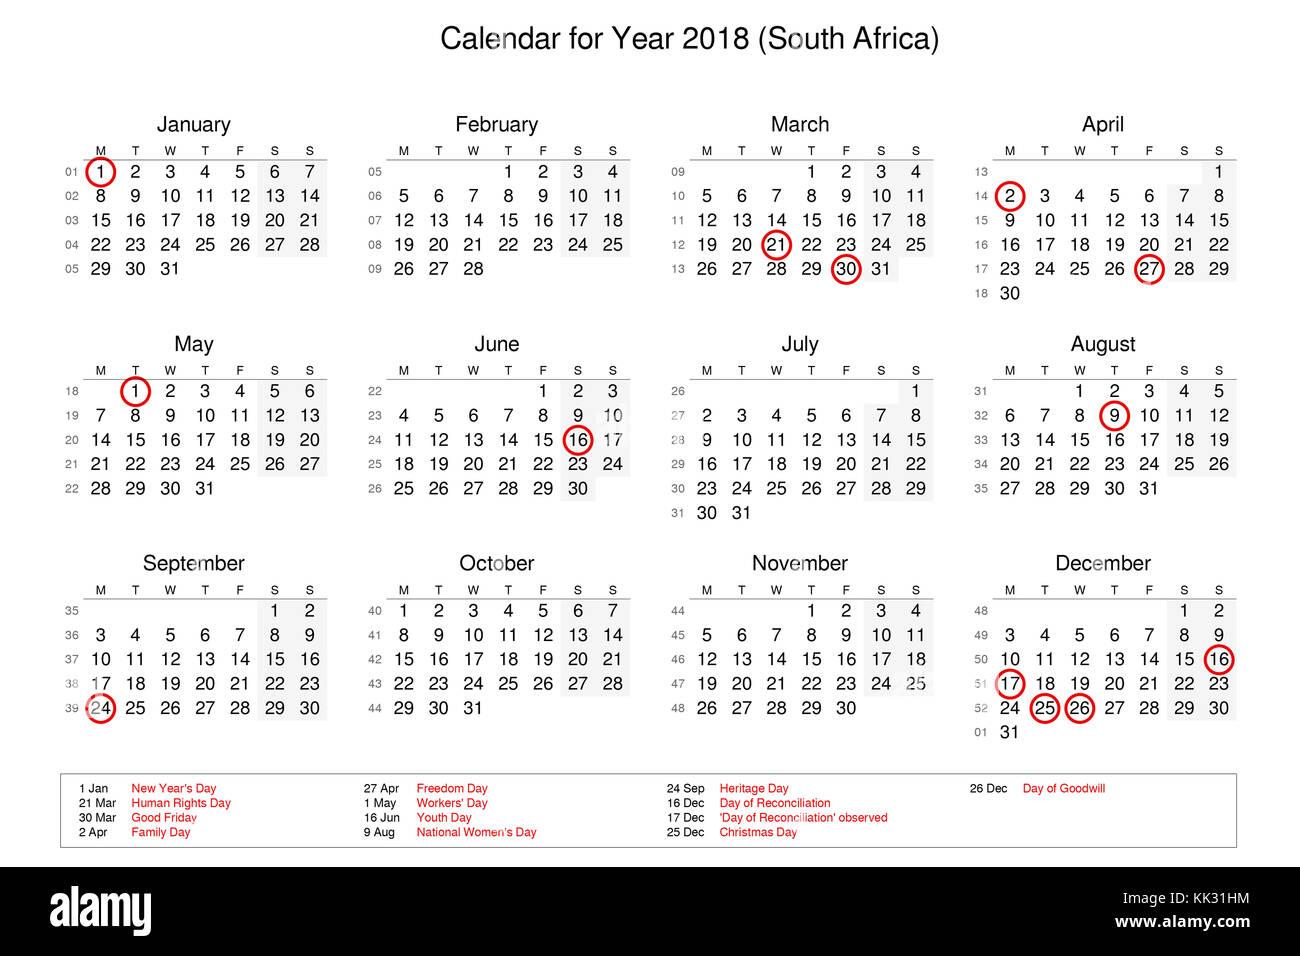 kalender afrika